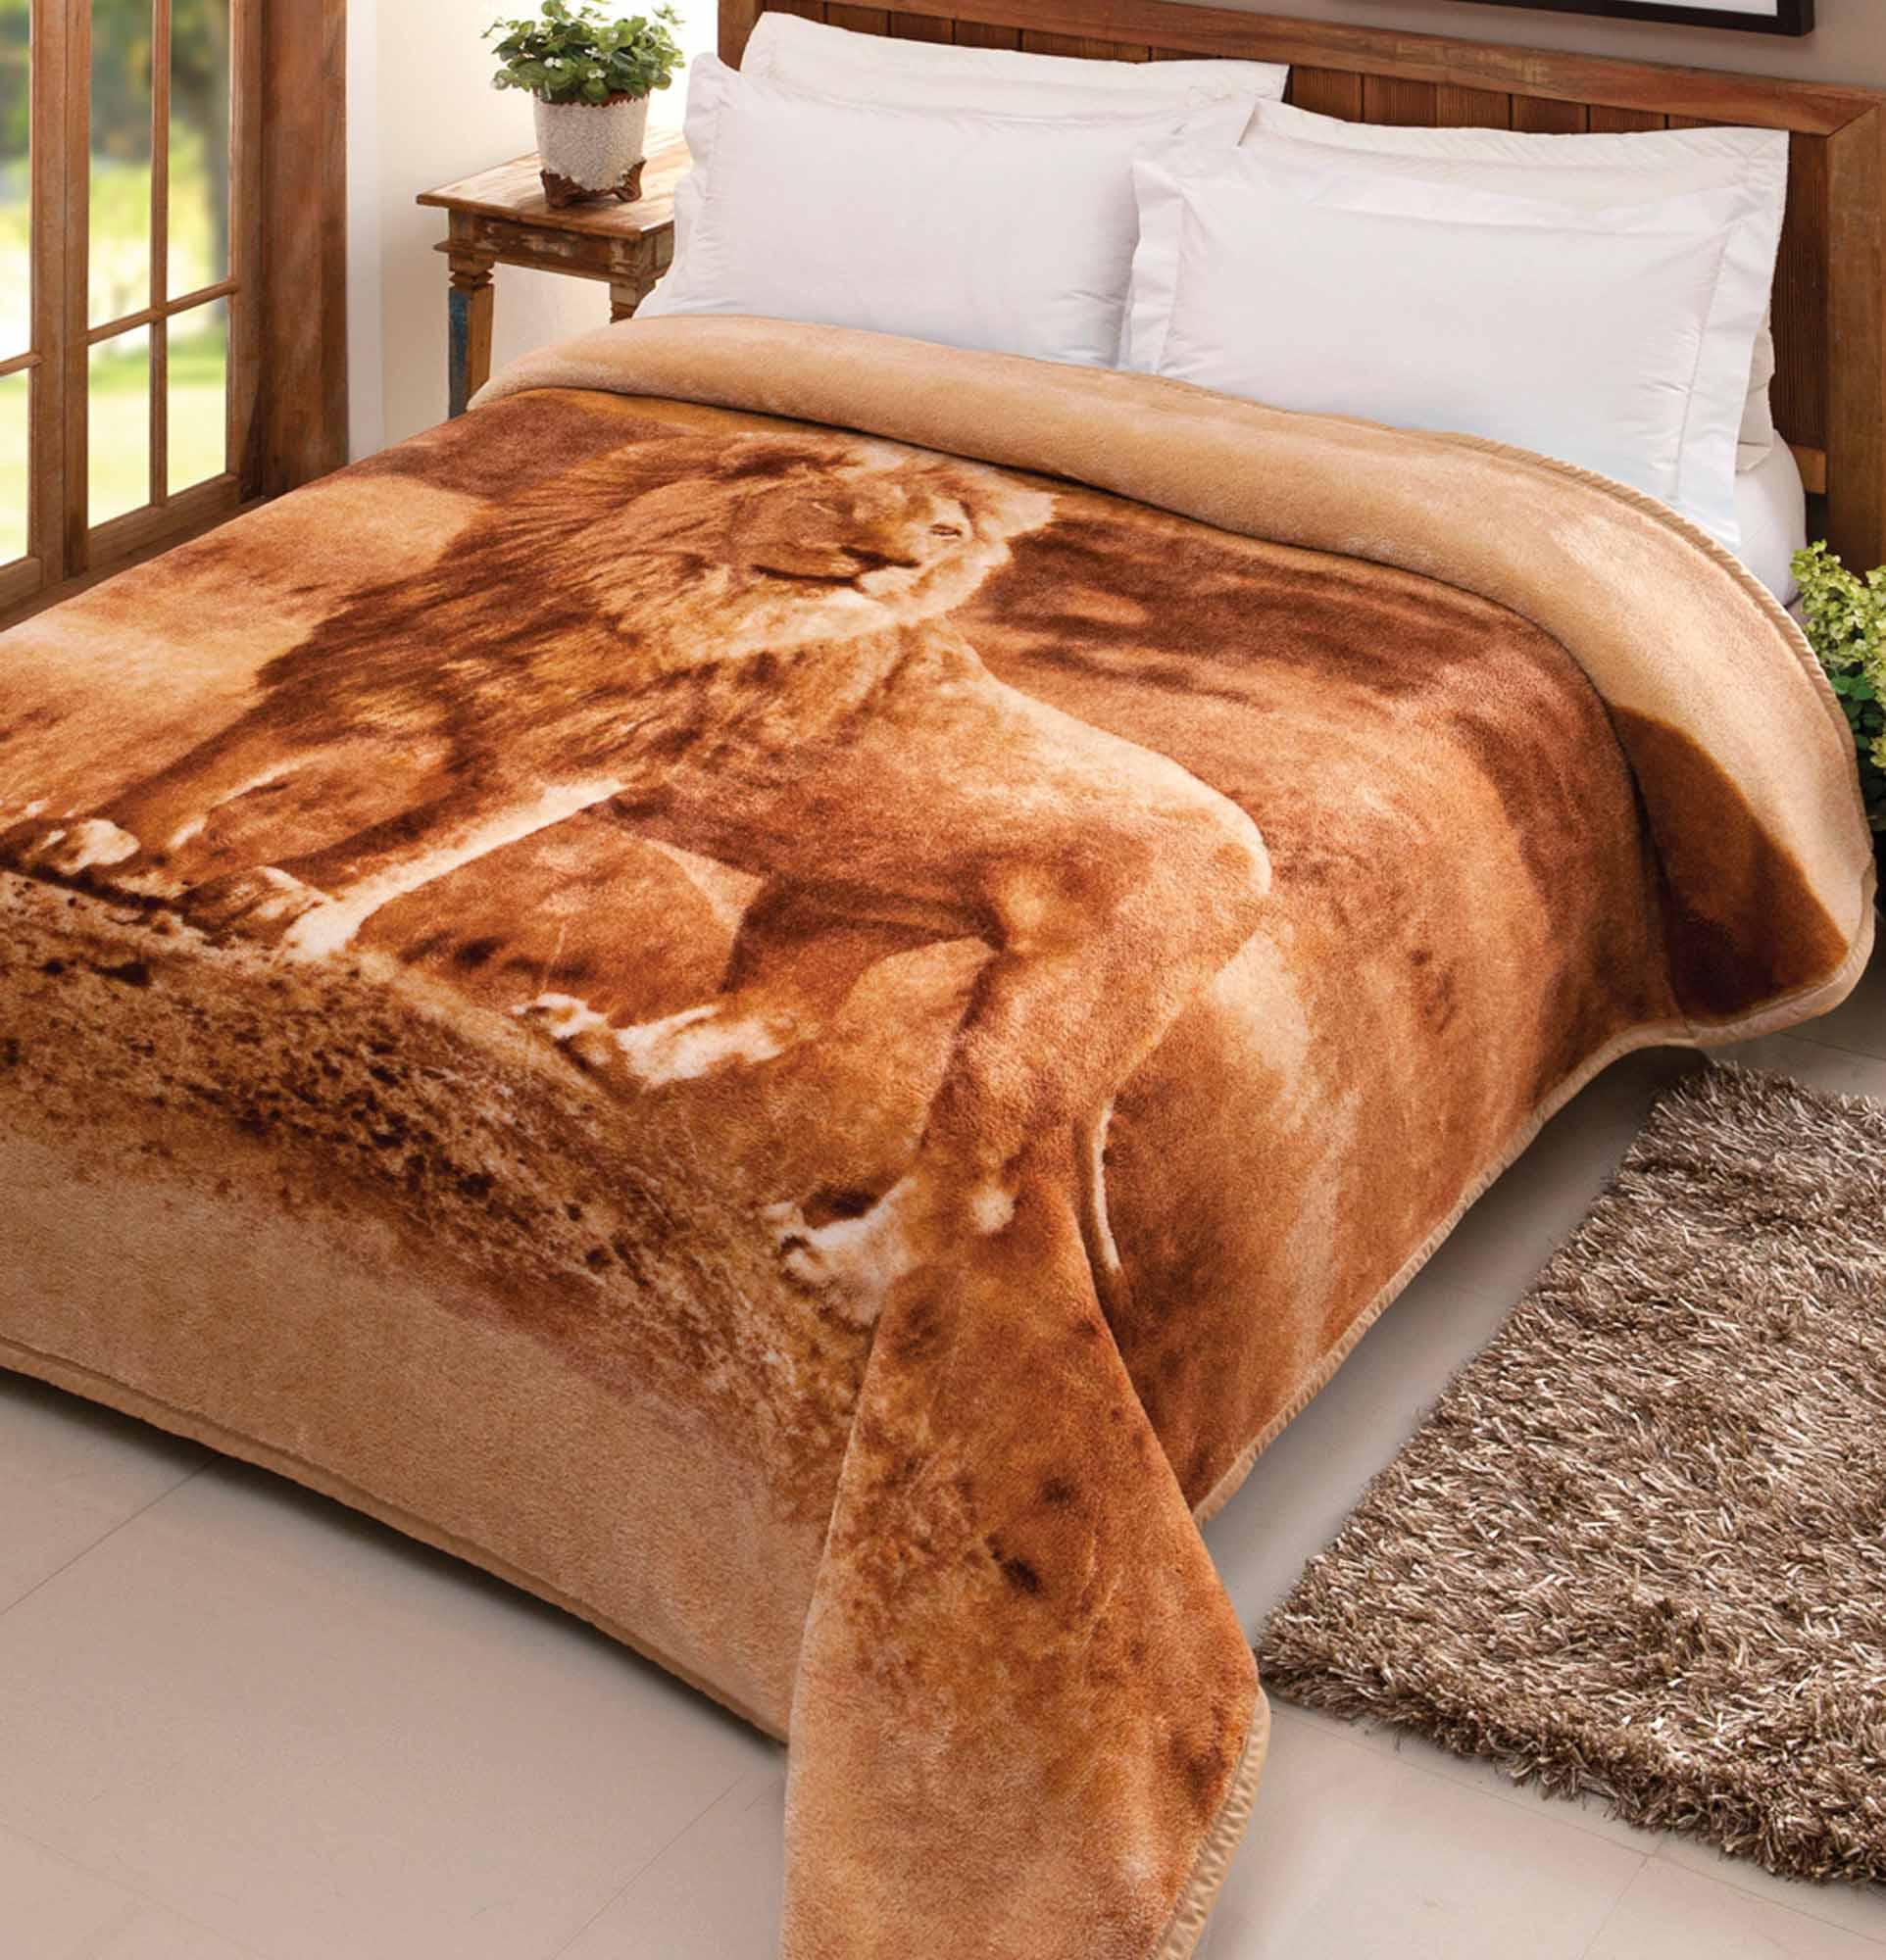 Cobertor Jolitex Casal Pelo Alto 1,80x2,20m Leao